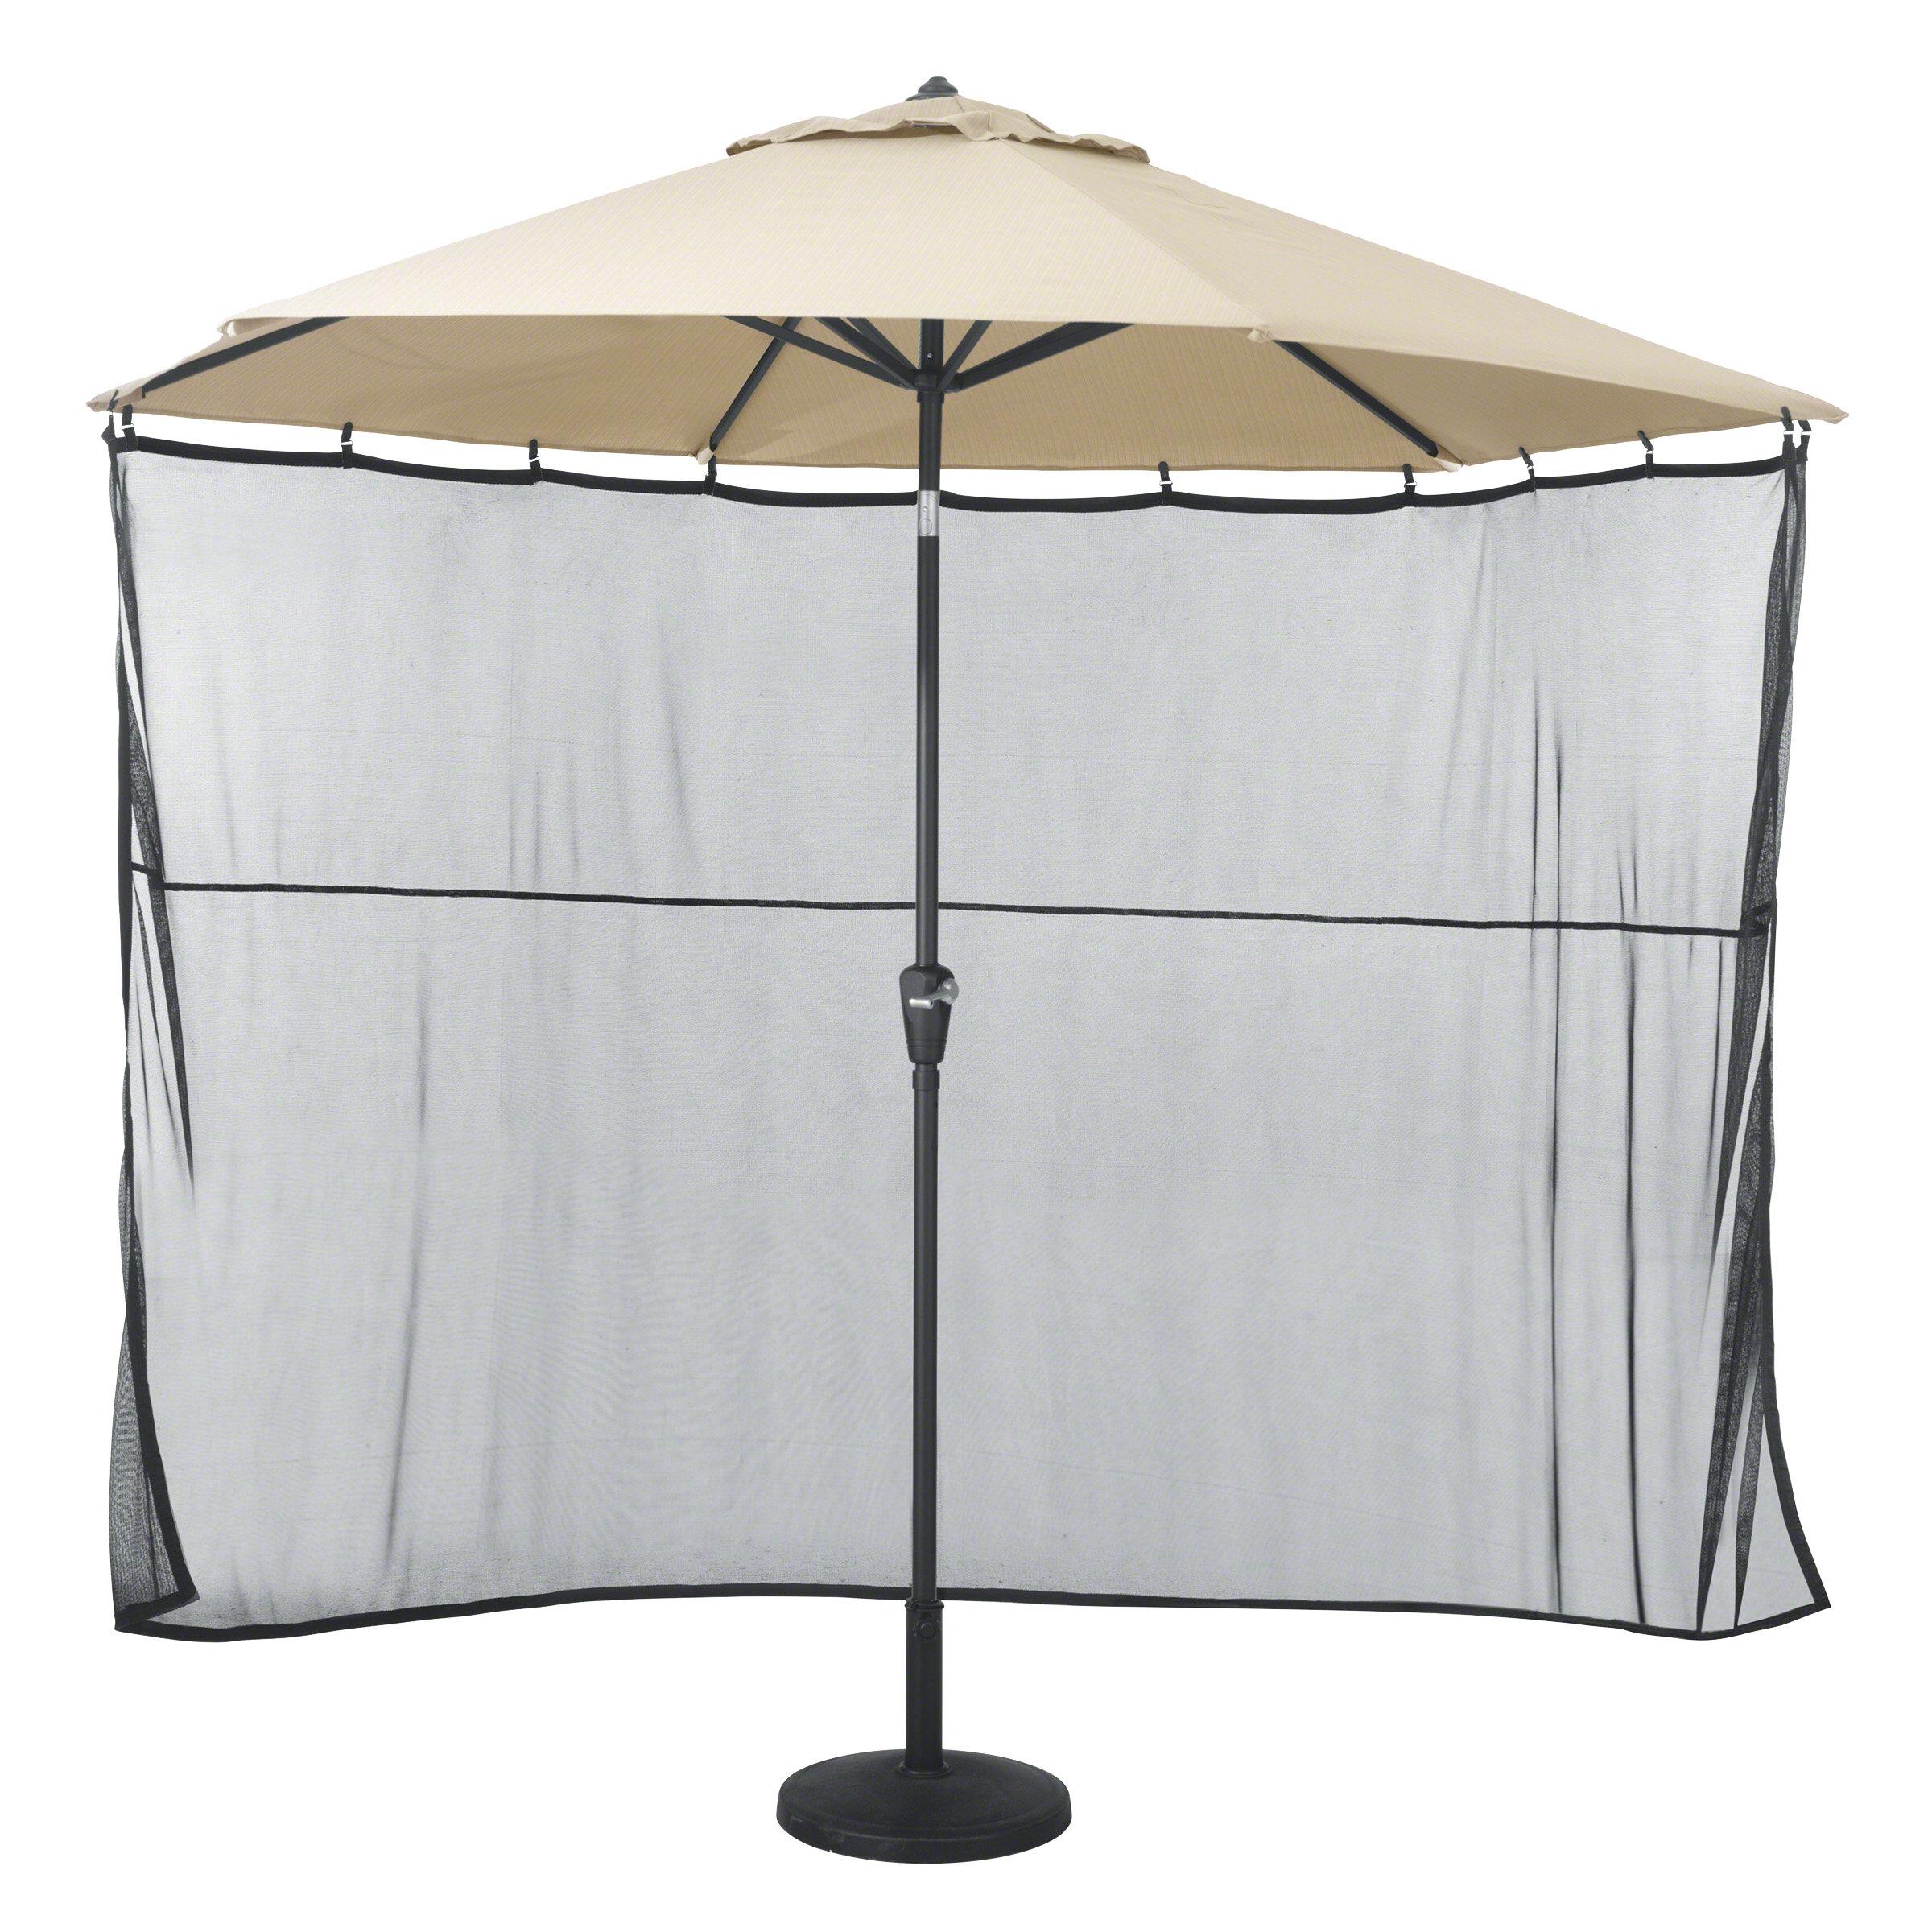 Freeport Park Hedon Patio Umbrella Side Wall Sun Shade Netting Reviews Wayfair